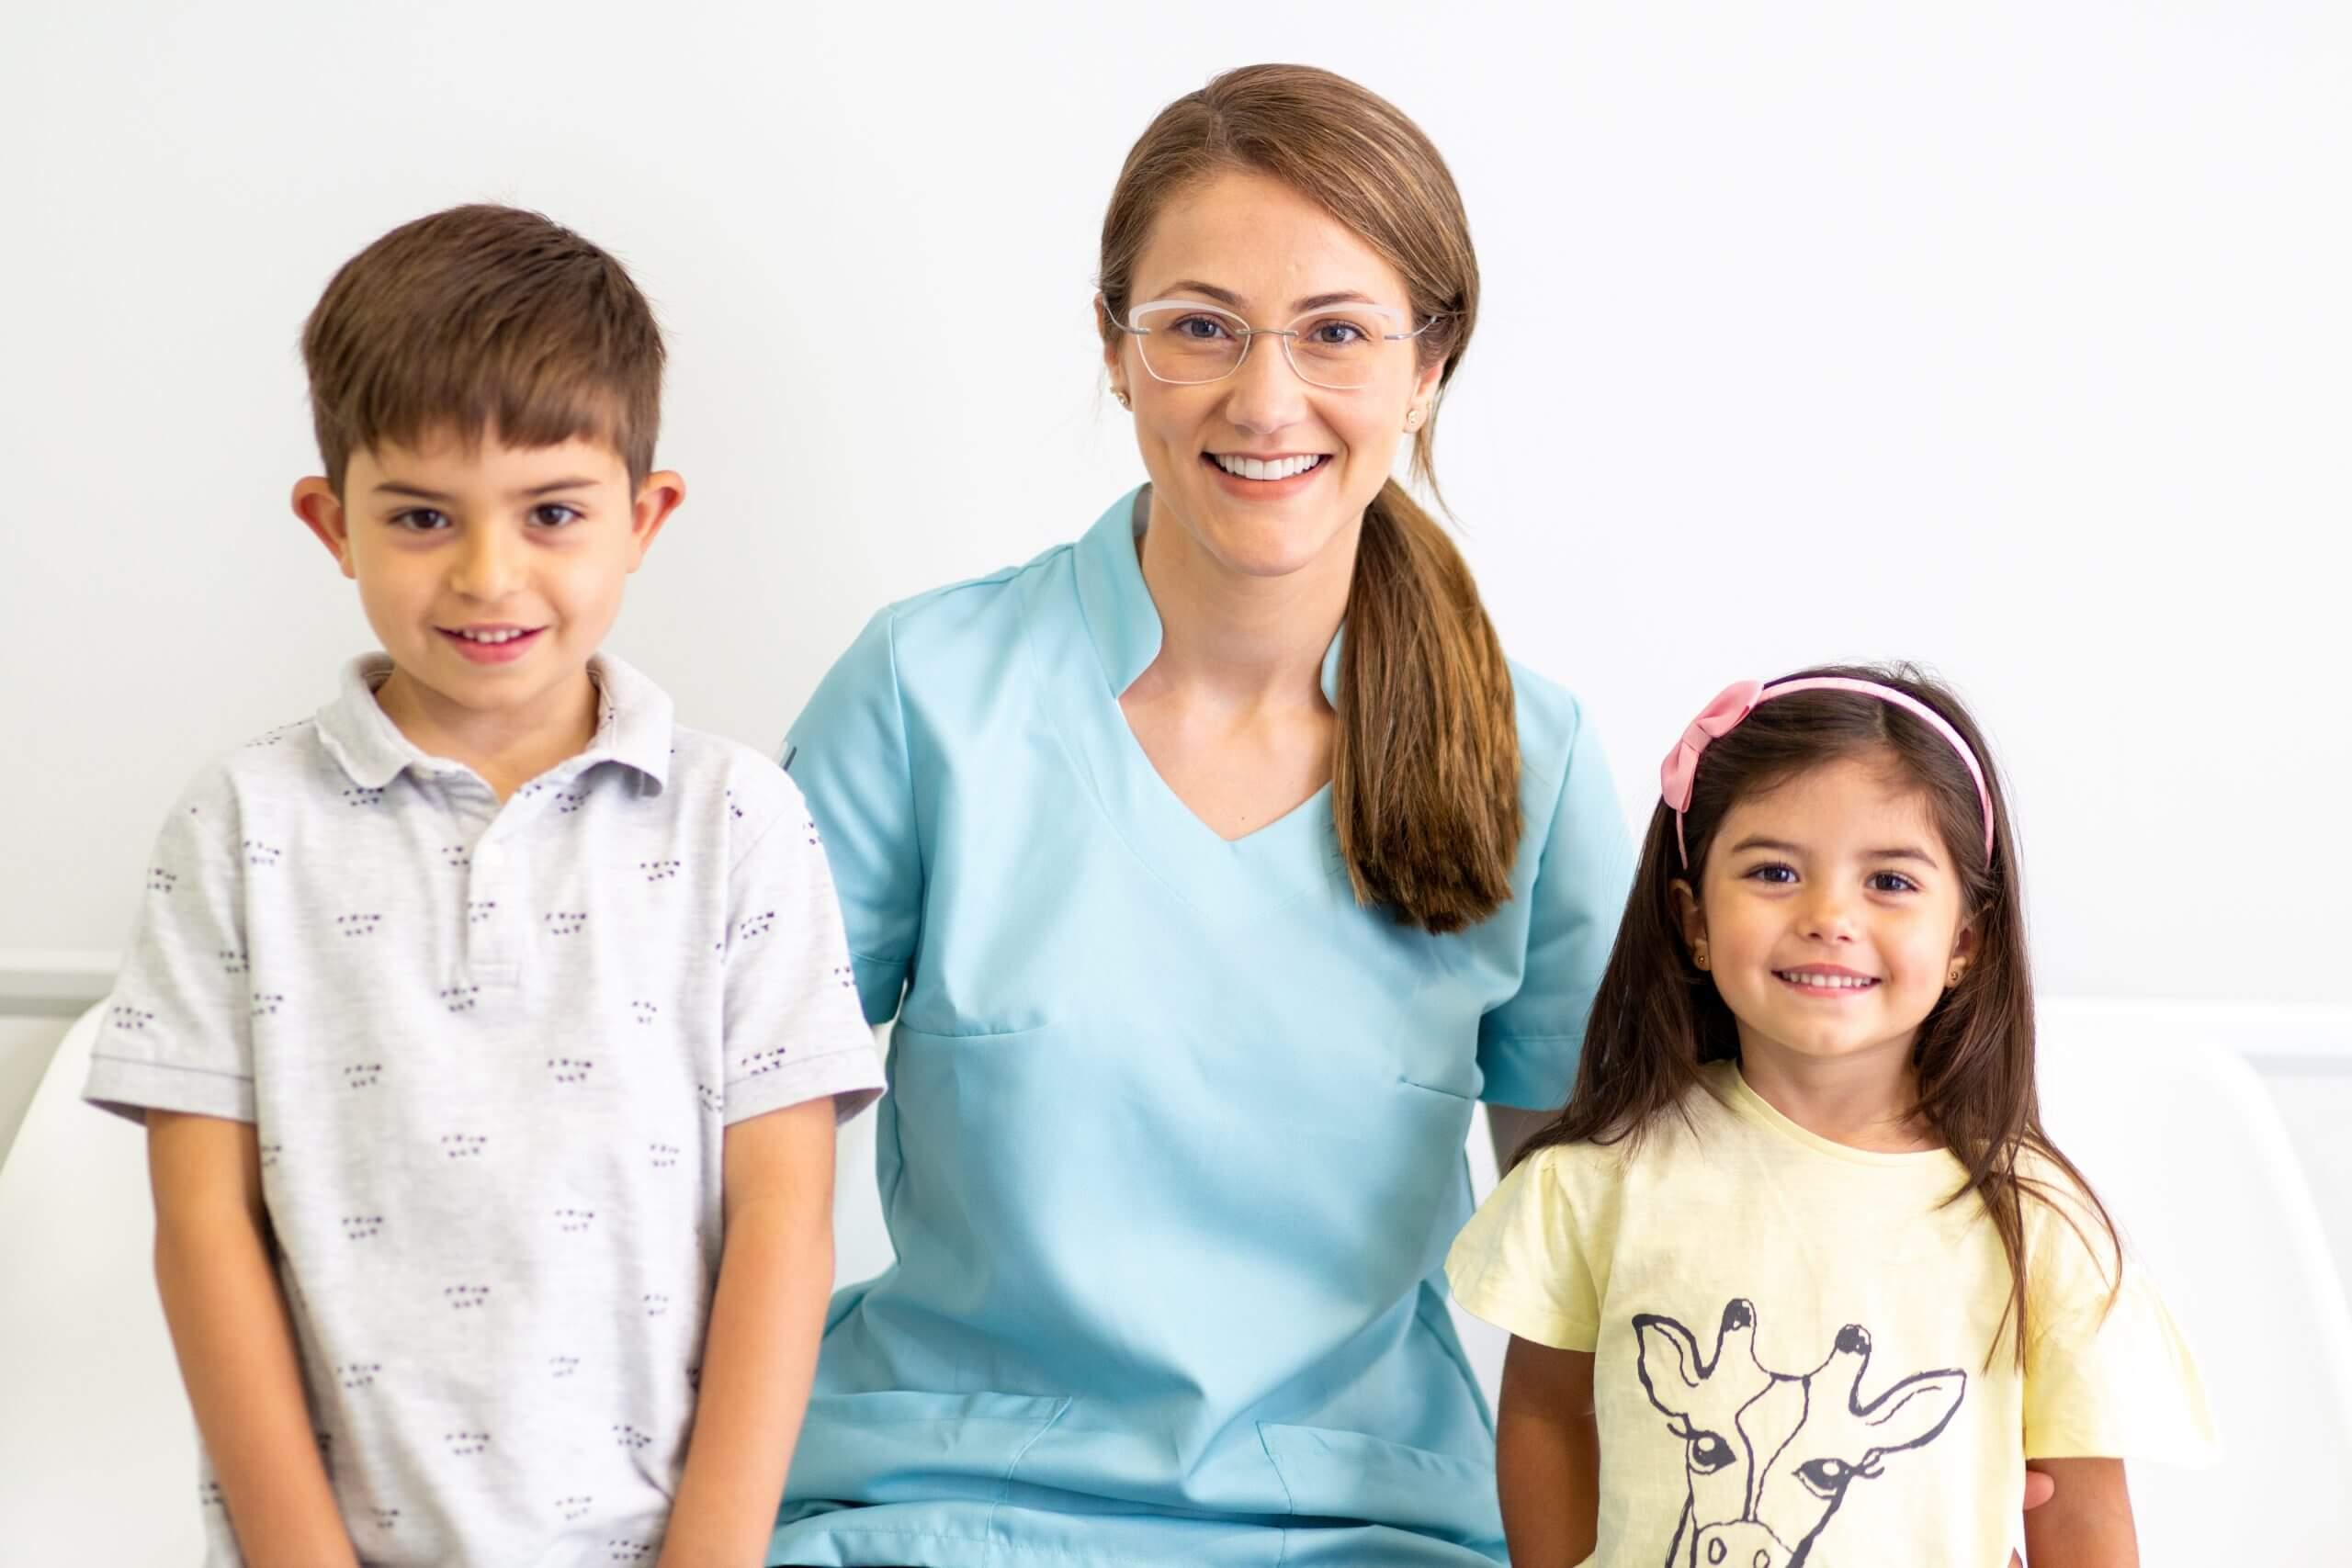 salud dental para niños